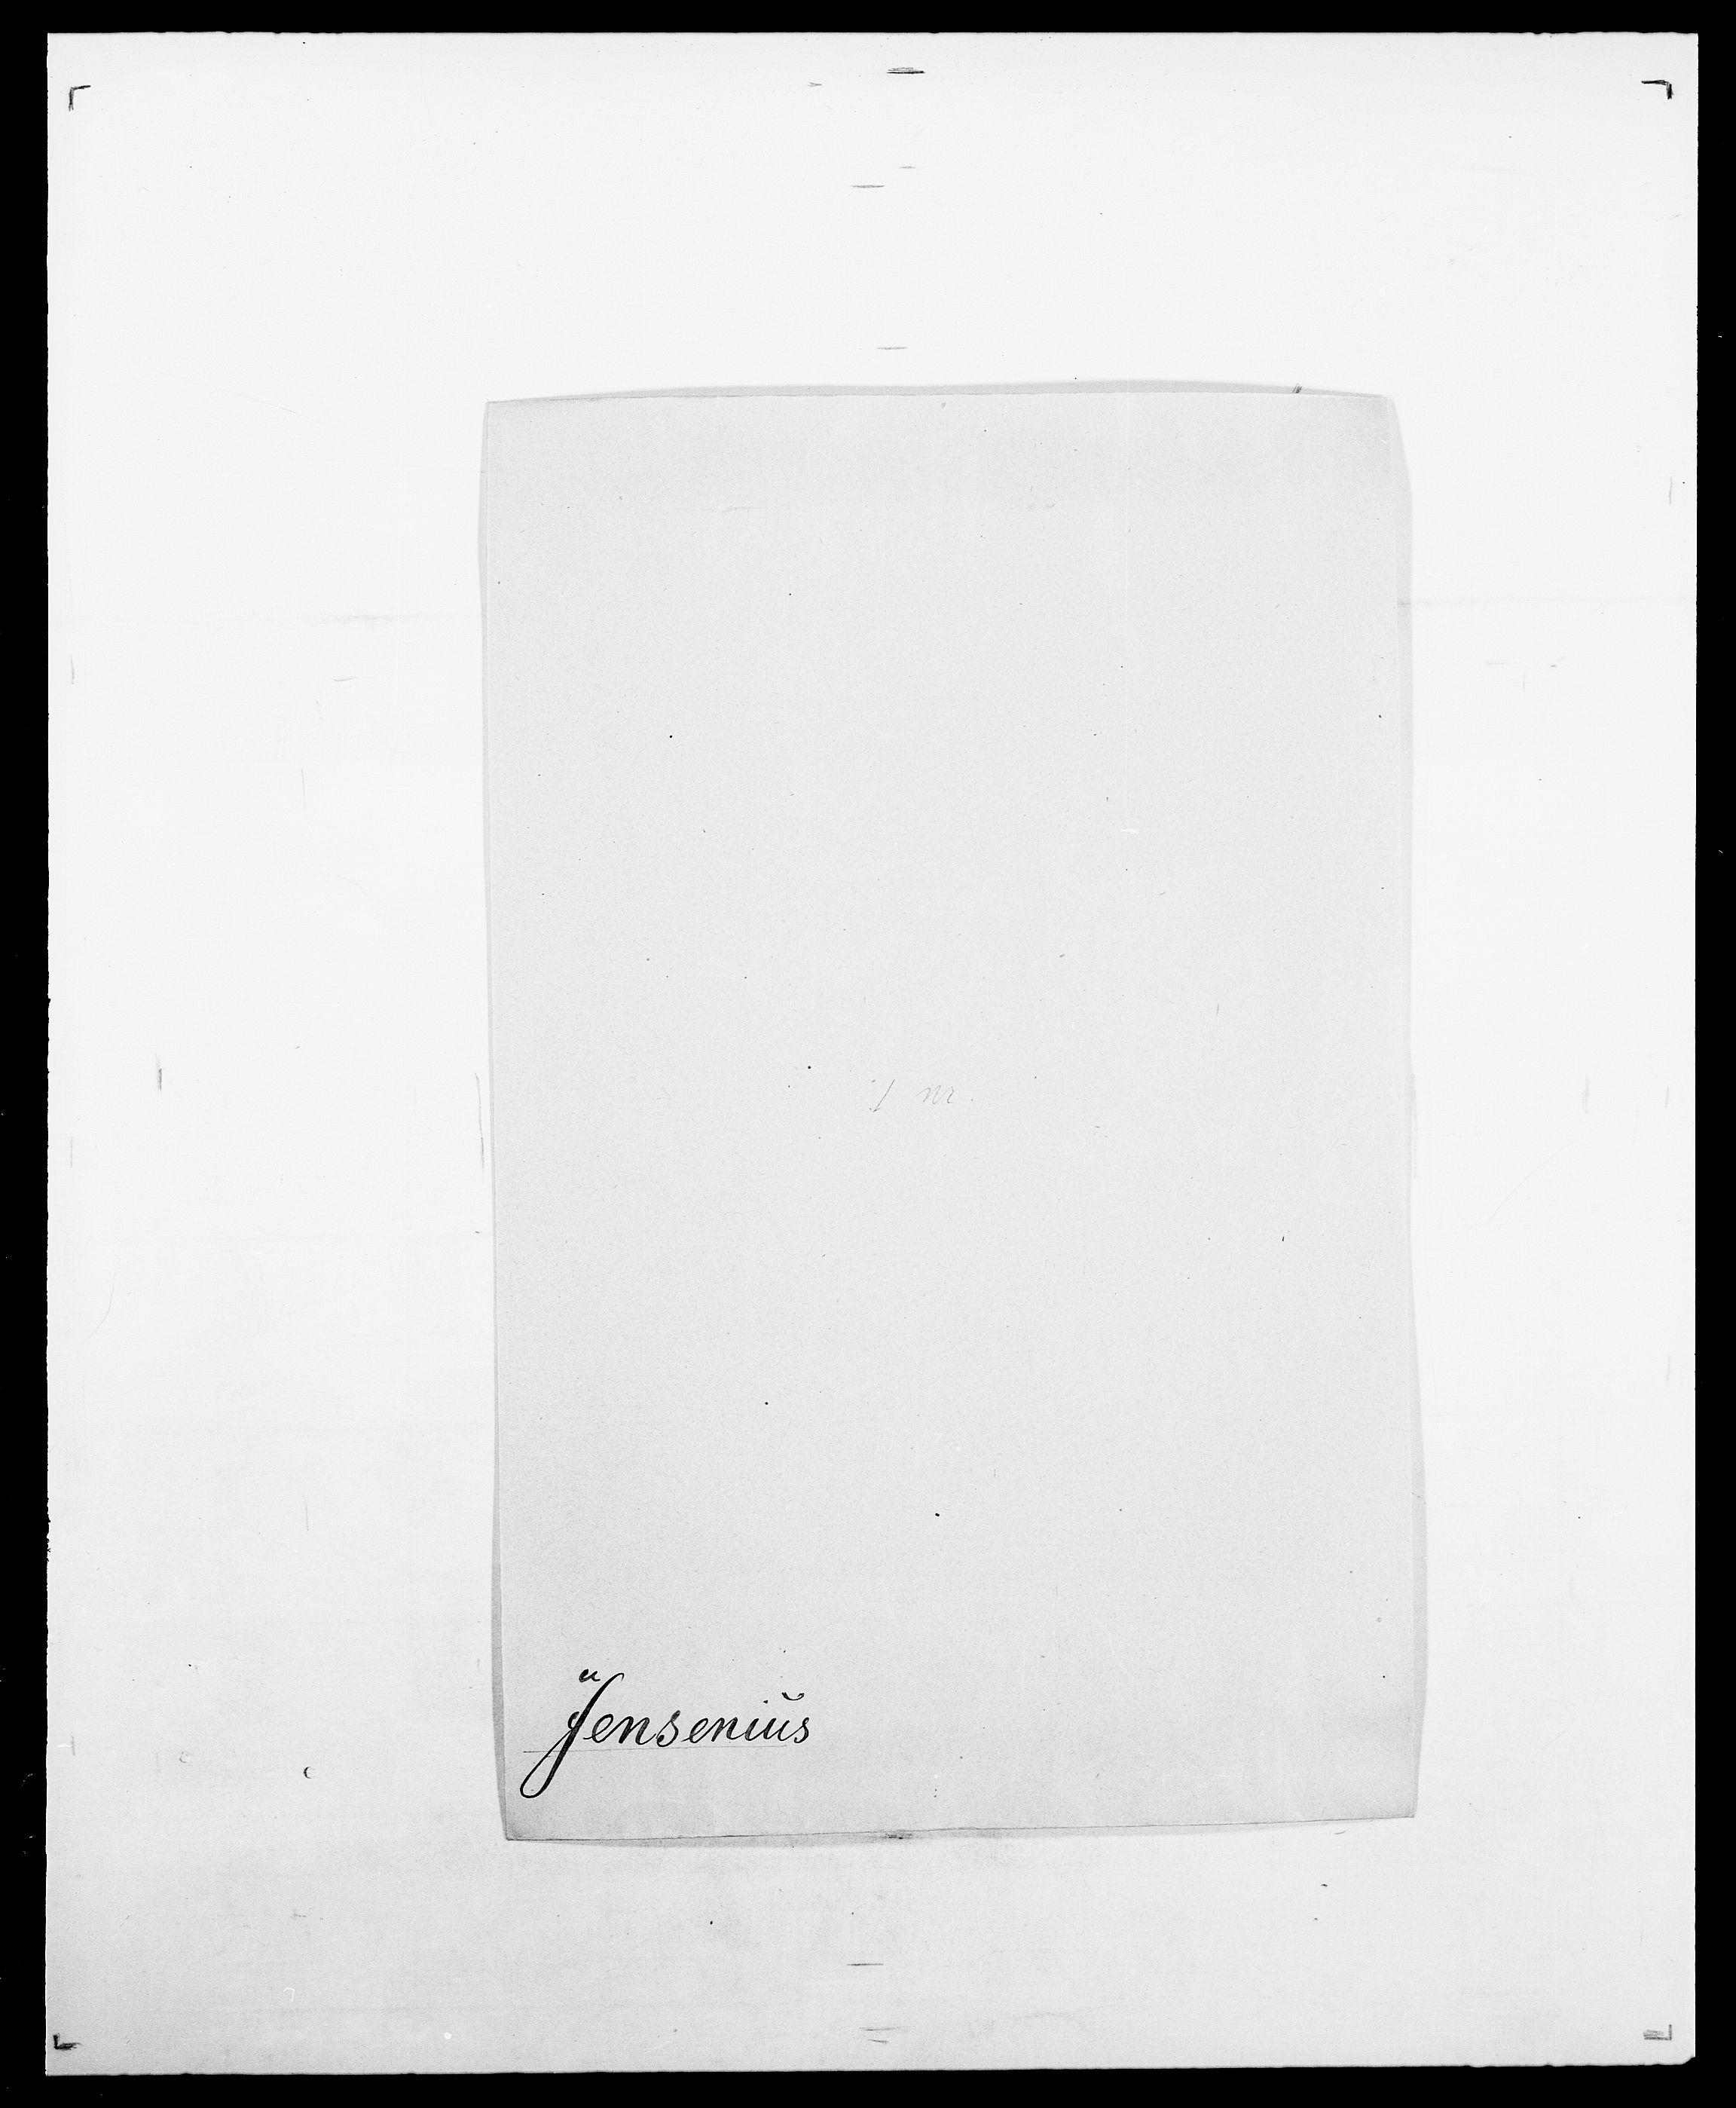 SAO, Delgobe, Charles Antoine - samling, D/Da/L0019: van der Hude - Joys, s. 635